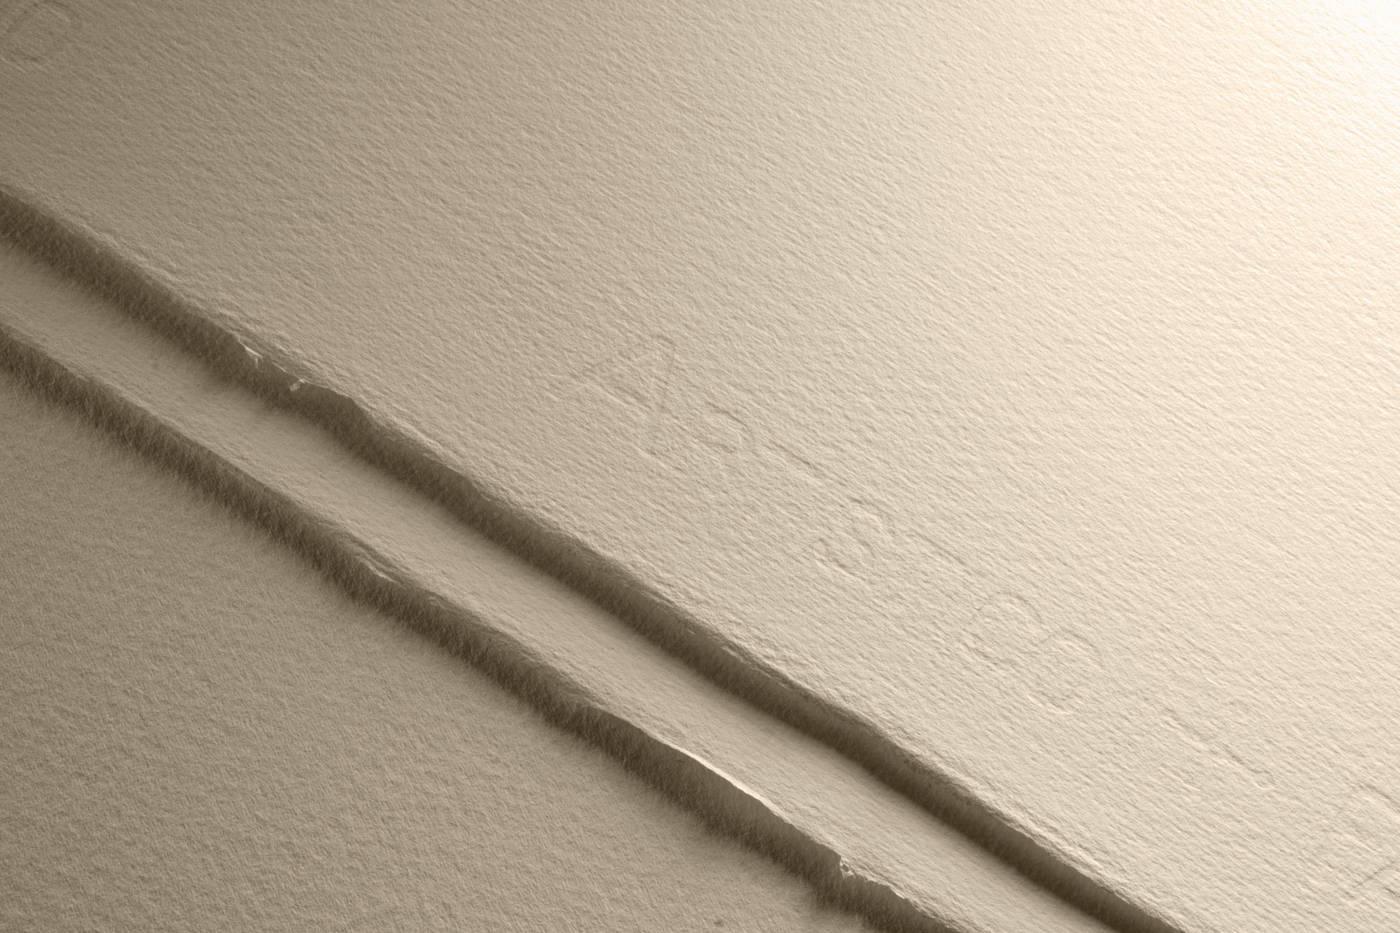 Купить Бумага для акварели Fabriano Artistico Traditional White 75х105 см 640 г Фин, Италия